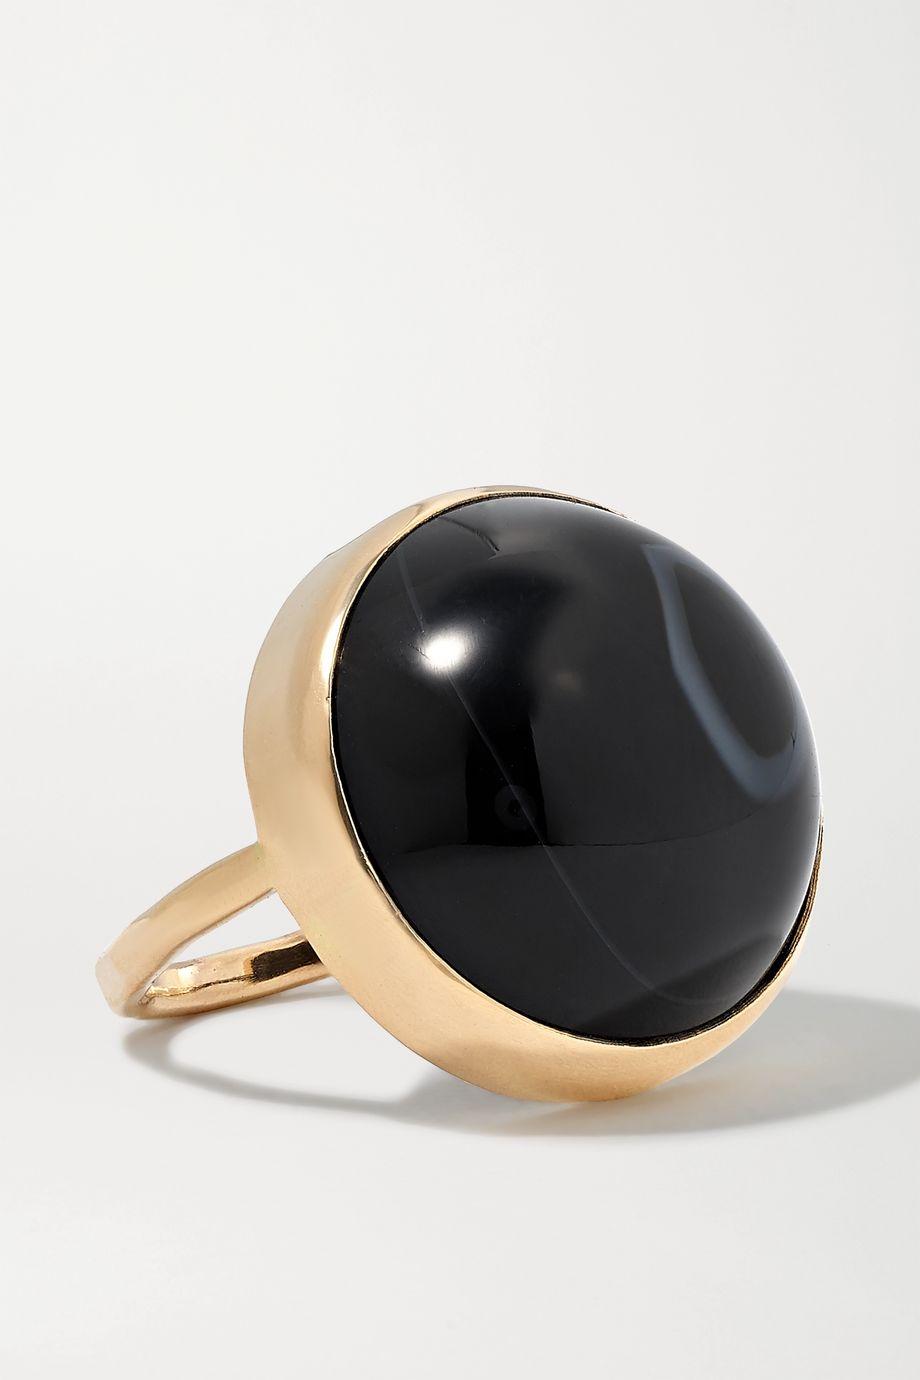 Melissa Joy Manning + NET SUSTAIN 14-karat gold agate ring